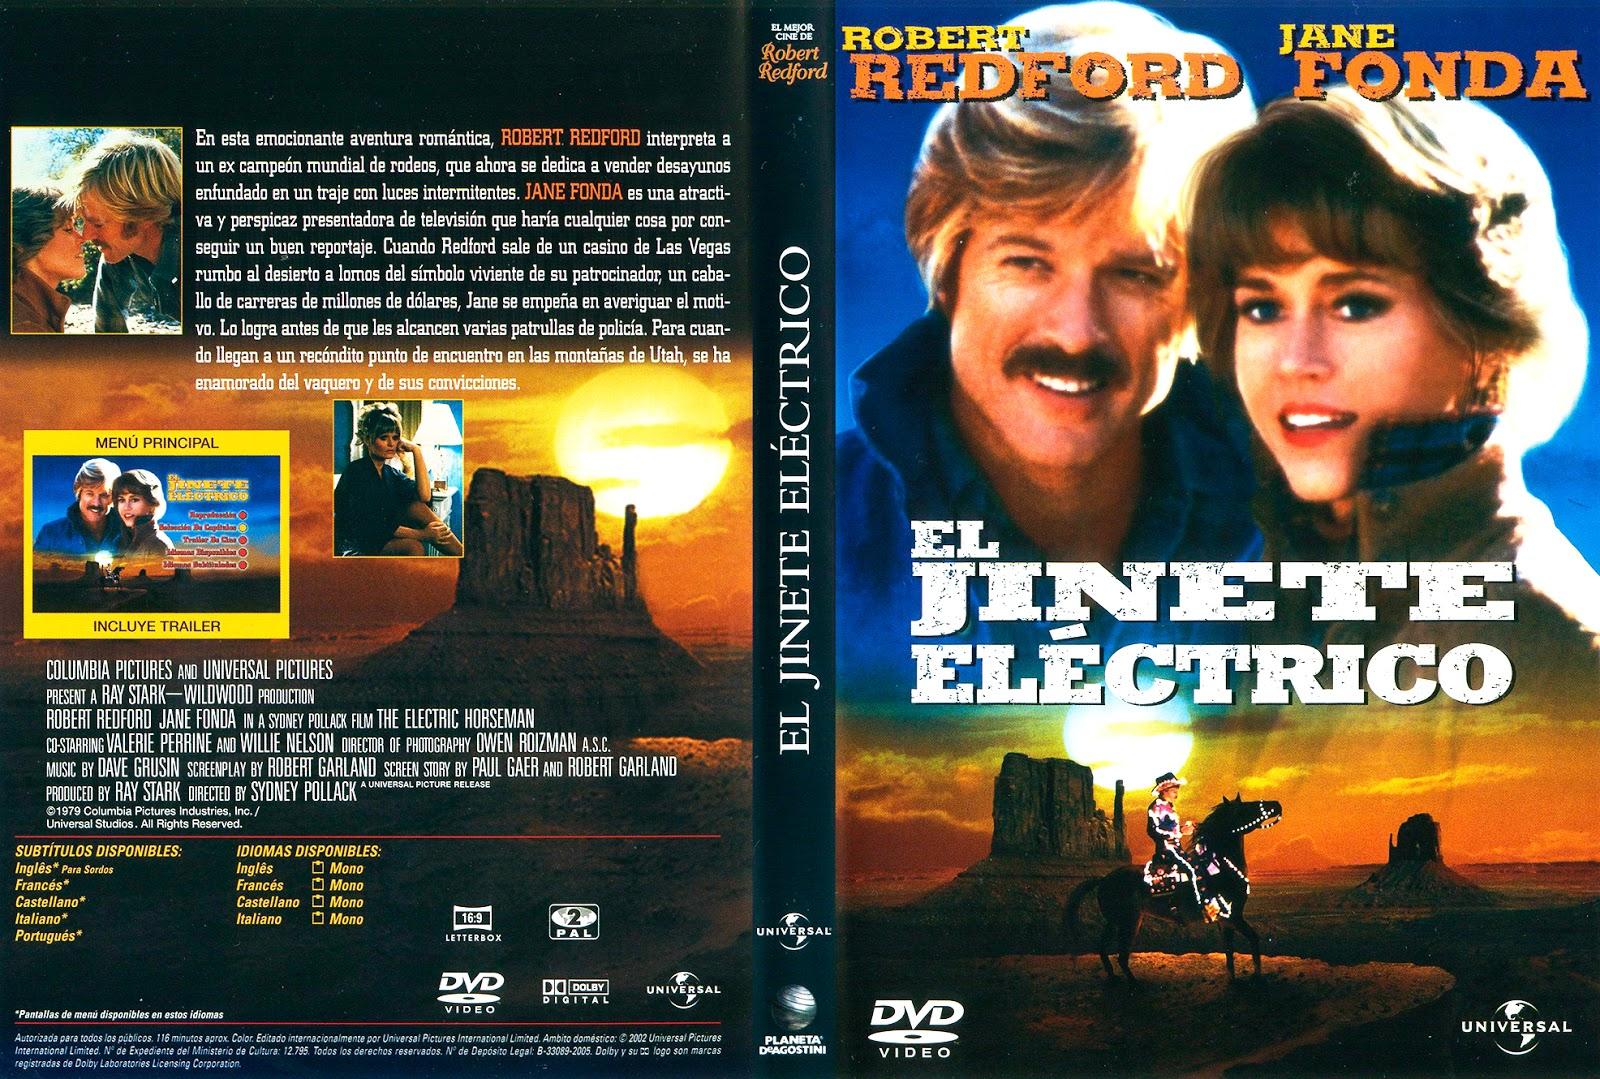 El jinete electrico (1979 - The Electric Horseman) - Caratula